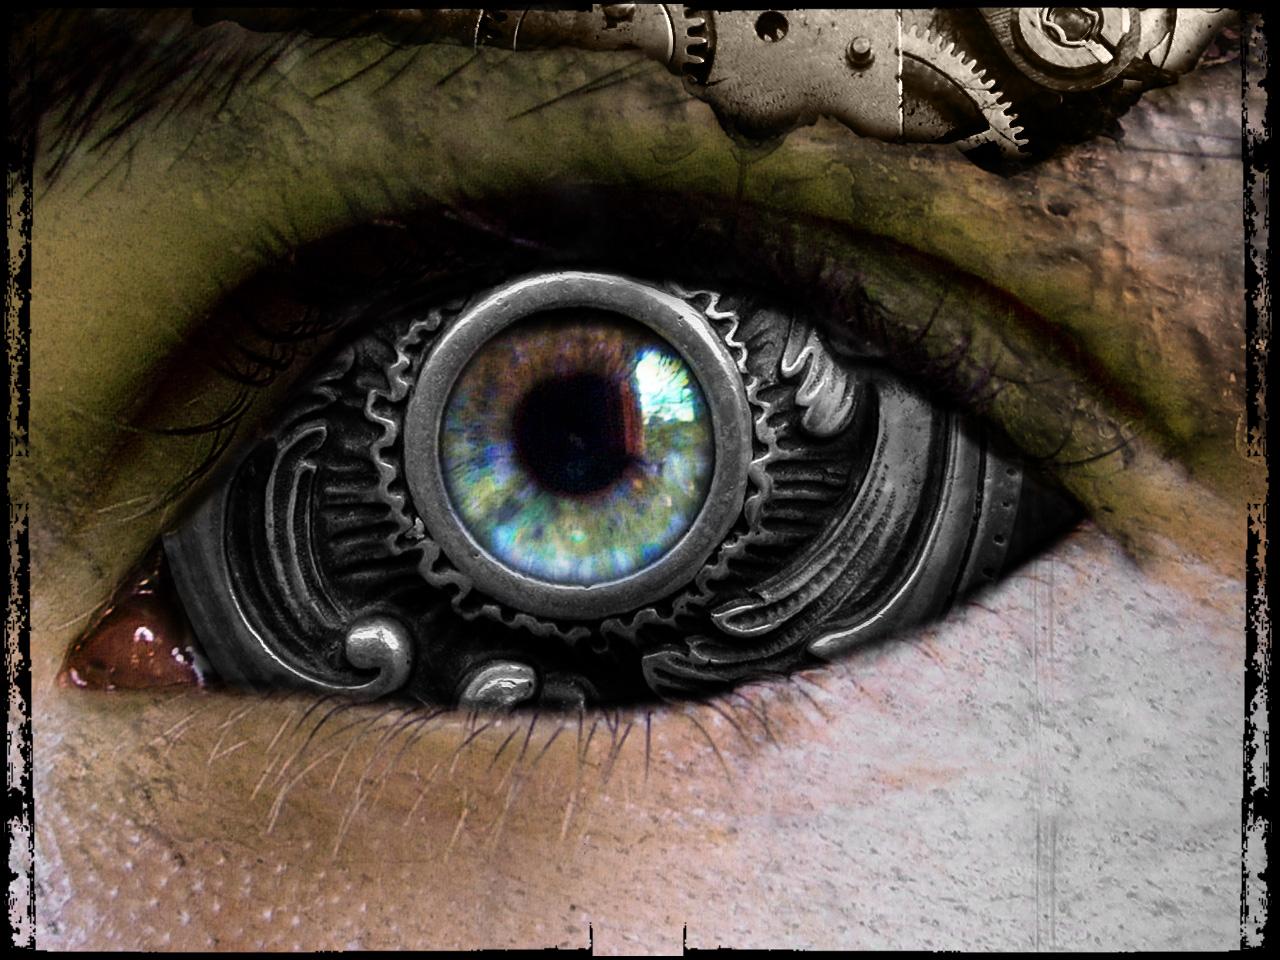 Eyes Steampunk Wallpaper 1280x960 Eyes Steampunk Iron 1280x960